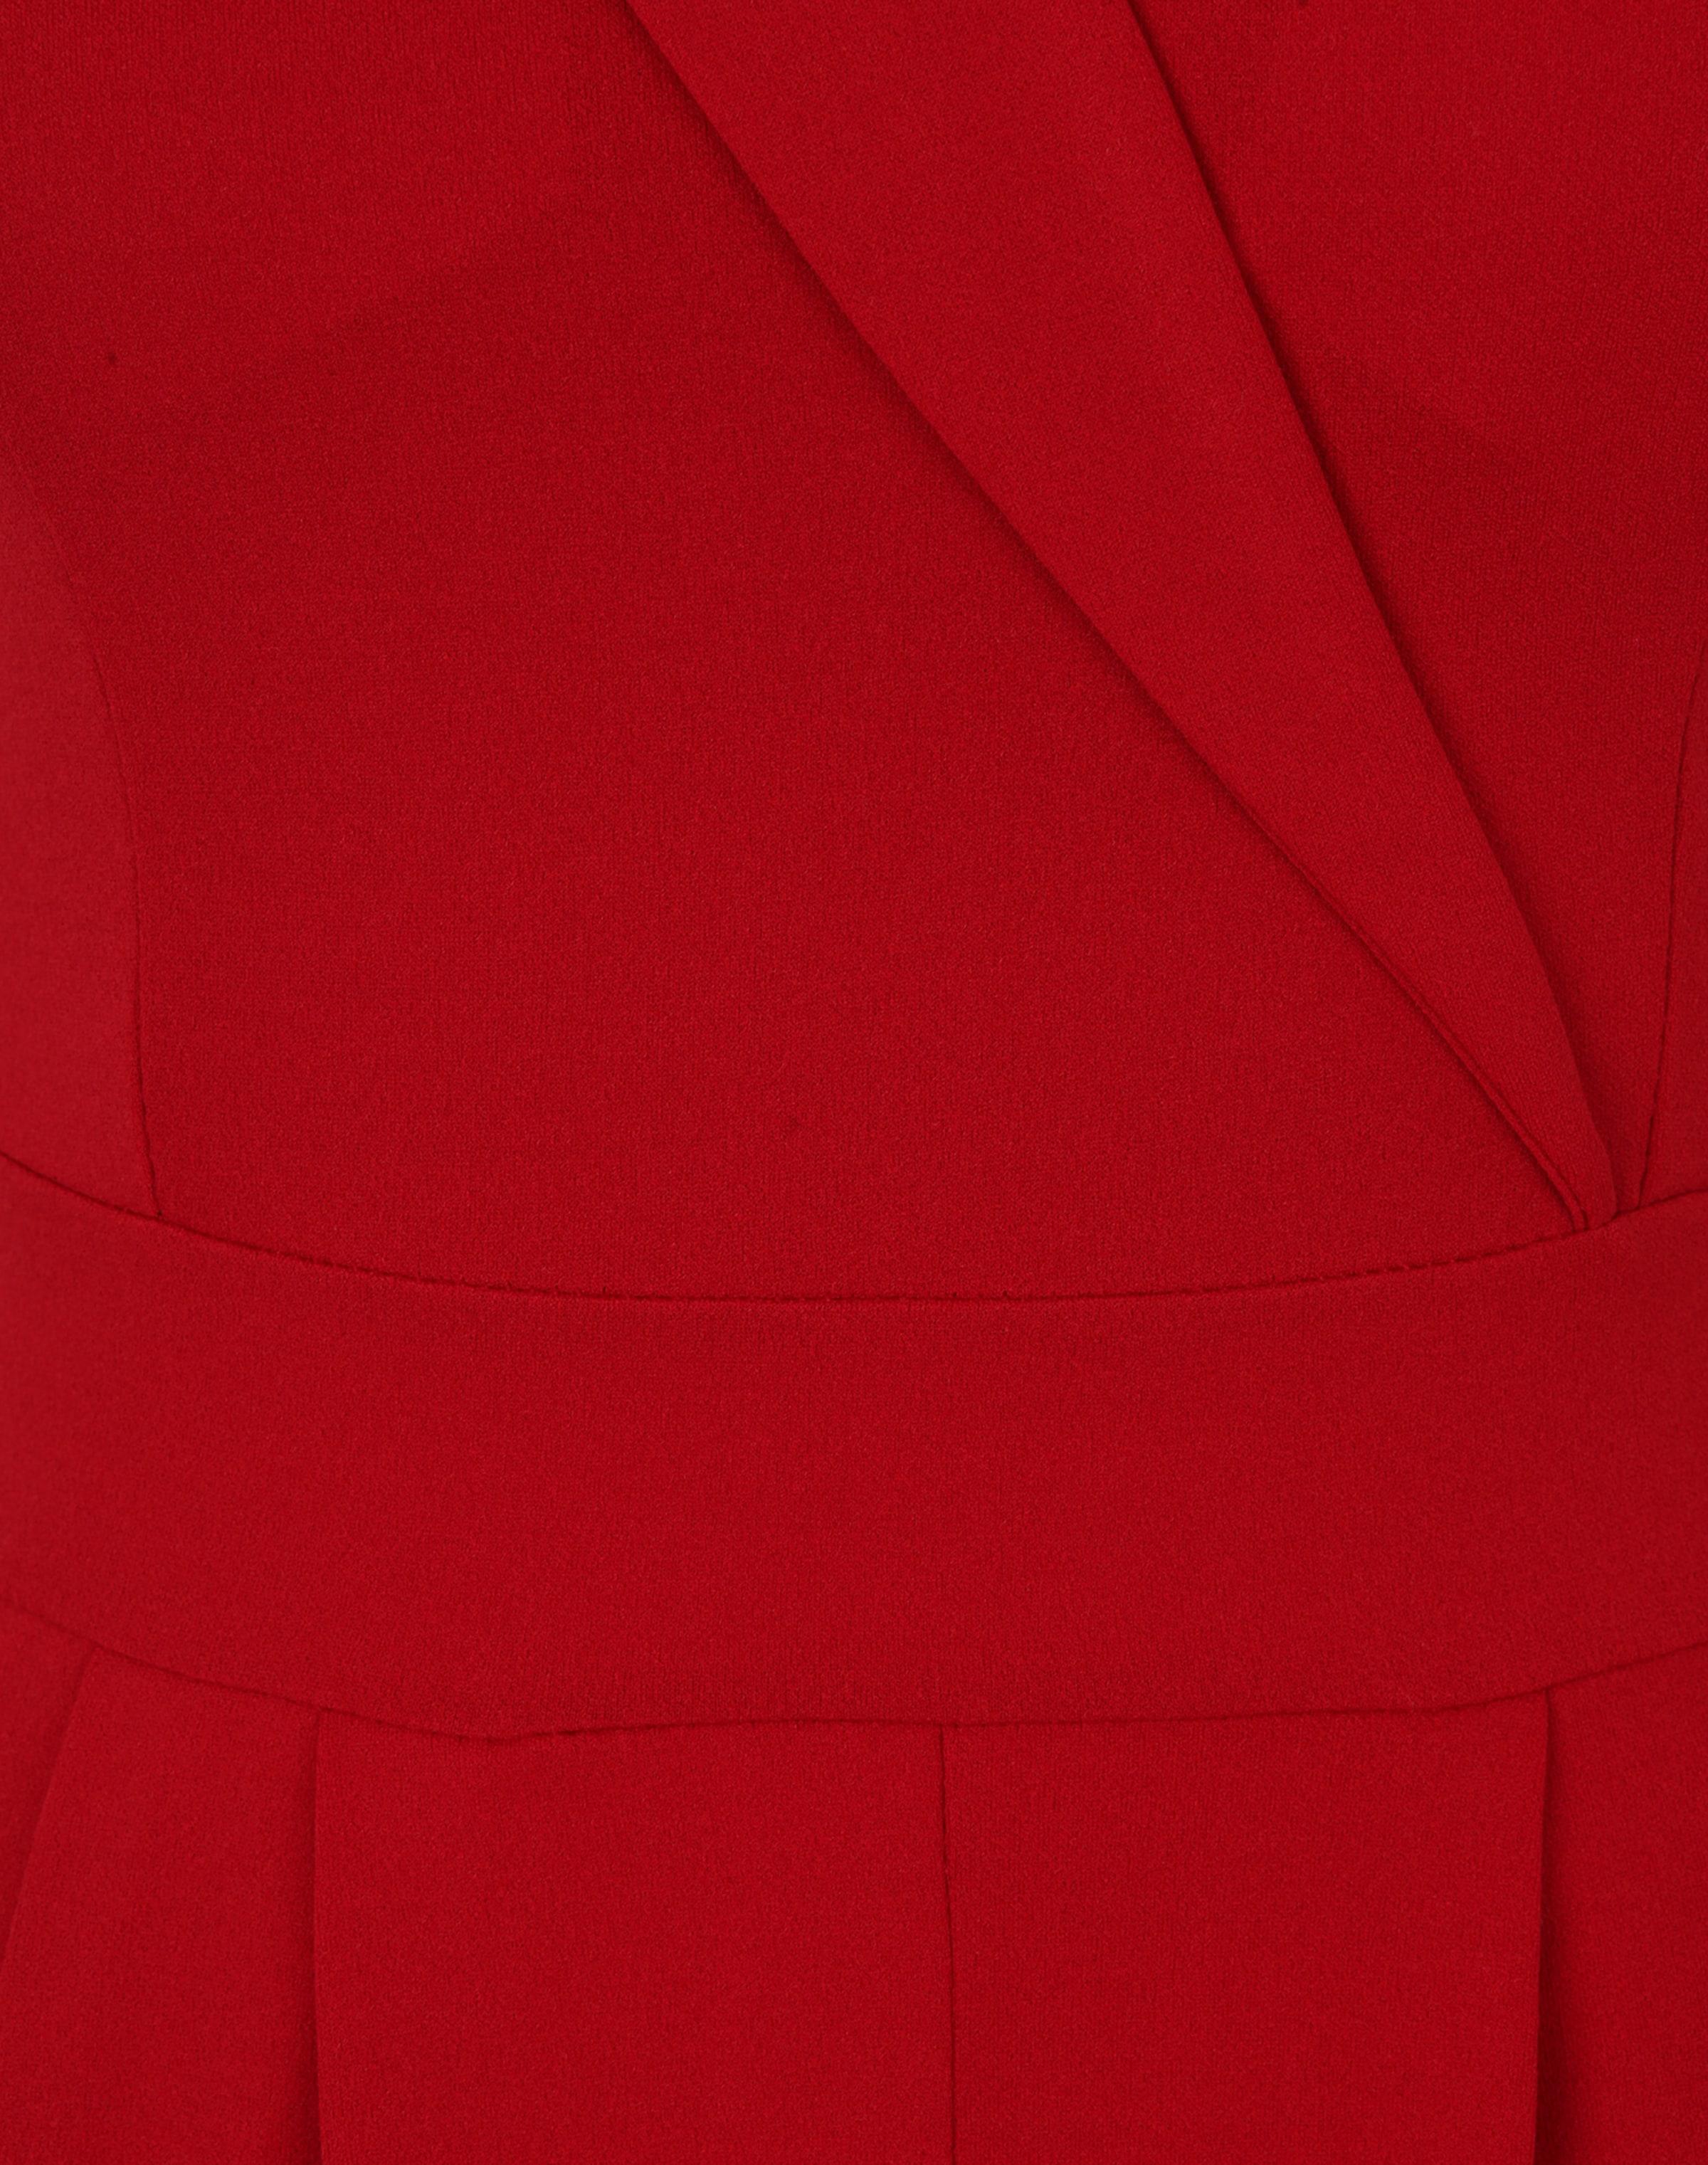 Original Billige Eastbay WAL G. Jumpsuit mit Bustier Auslass Beste Ort 8tuIeGv1n